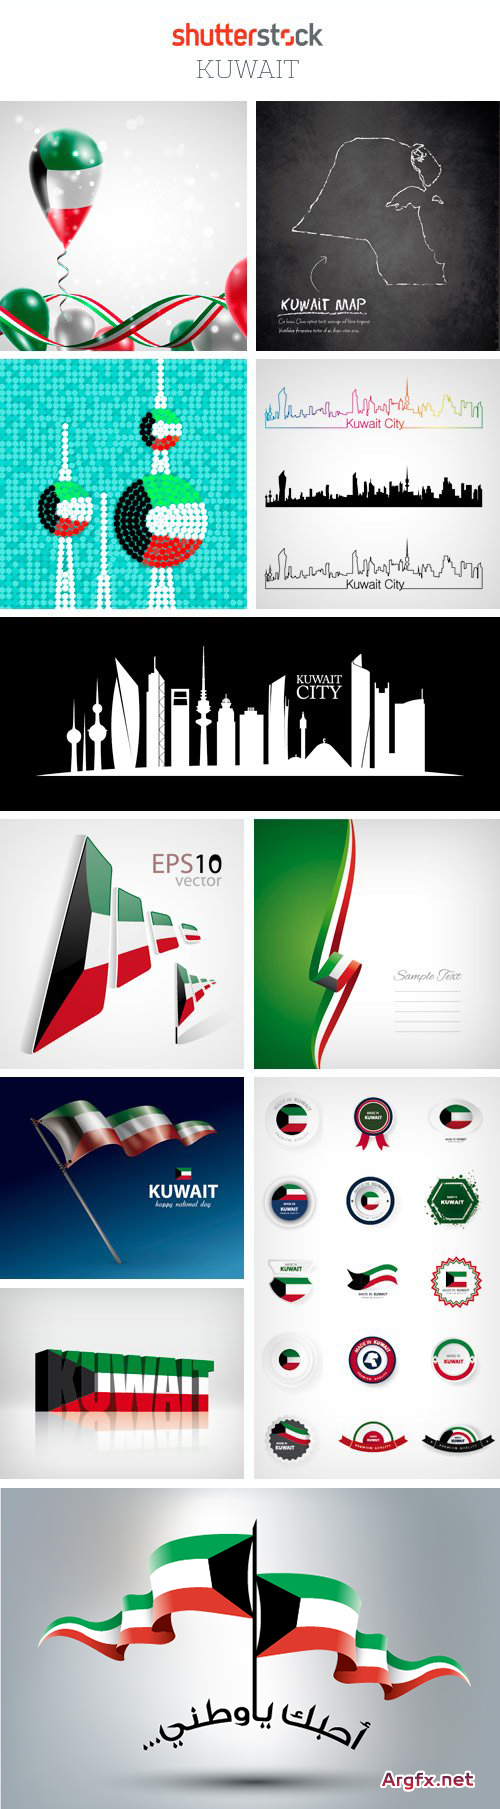 Amazing SS - Kuwait, 25xEPS